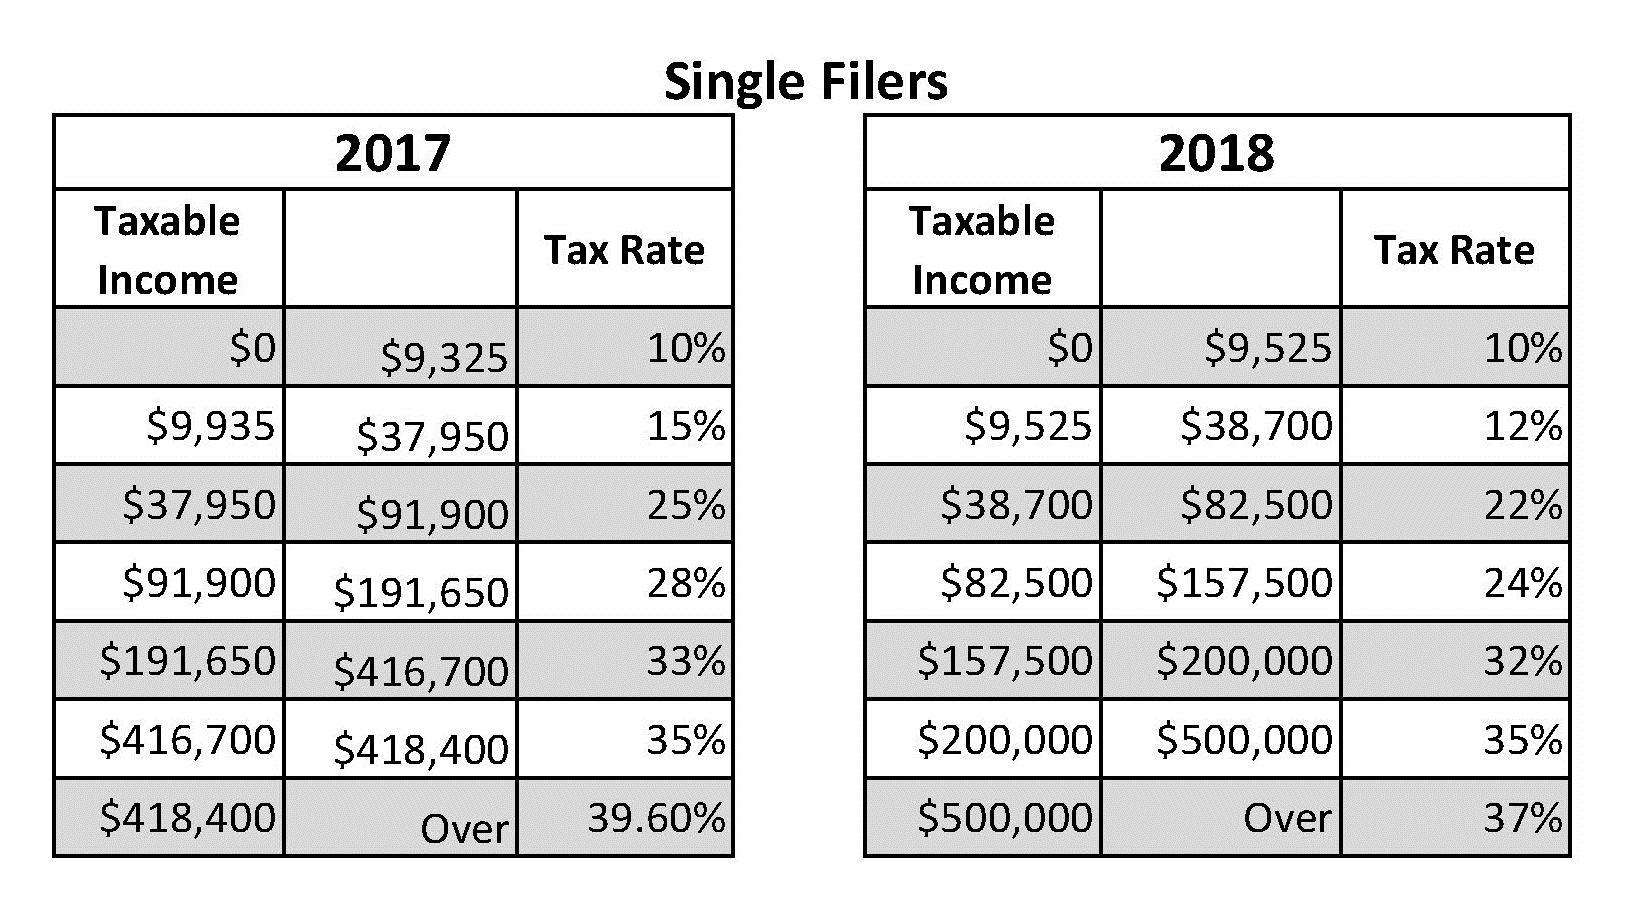 Singler Filers under 2018 tax law